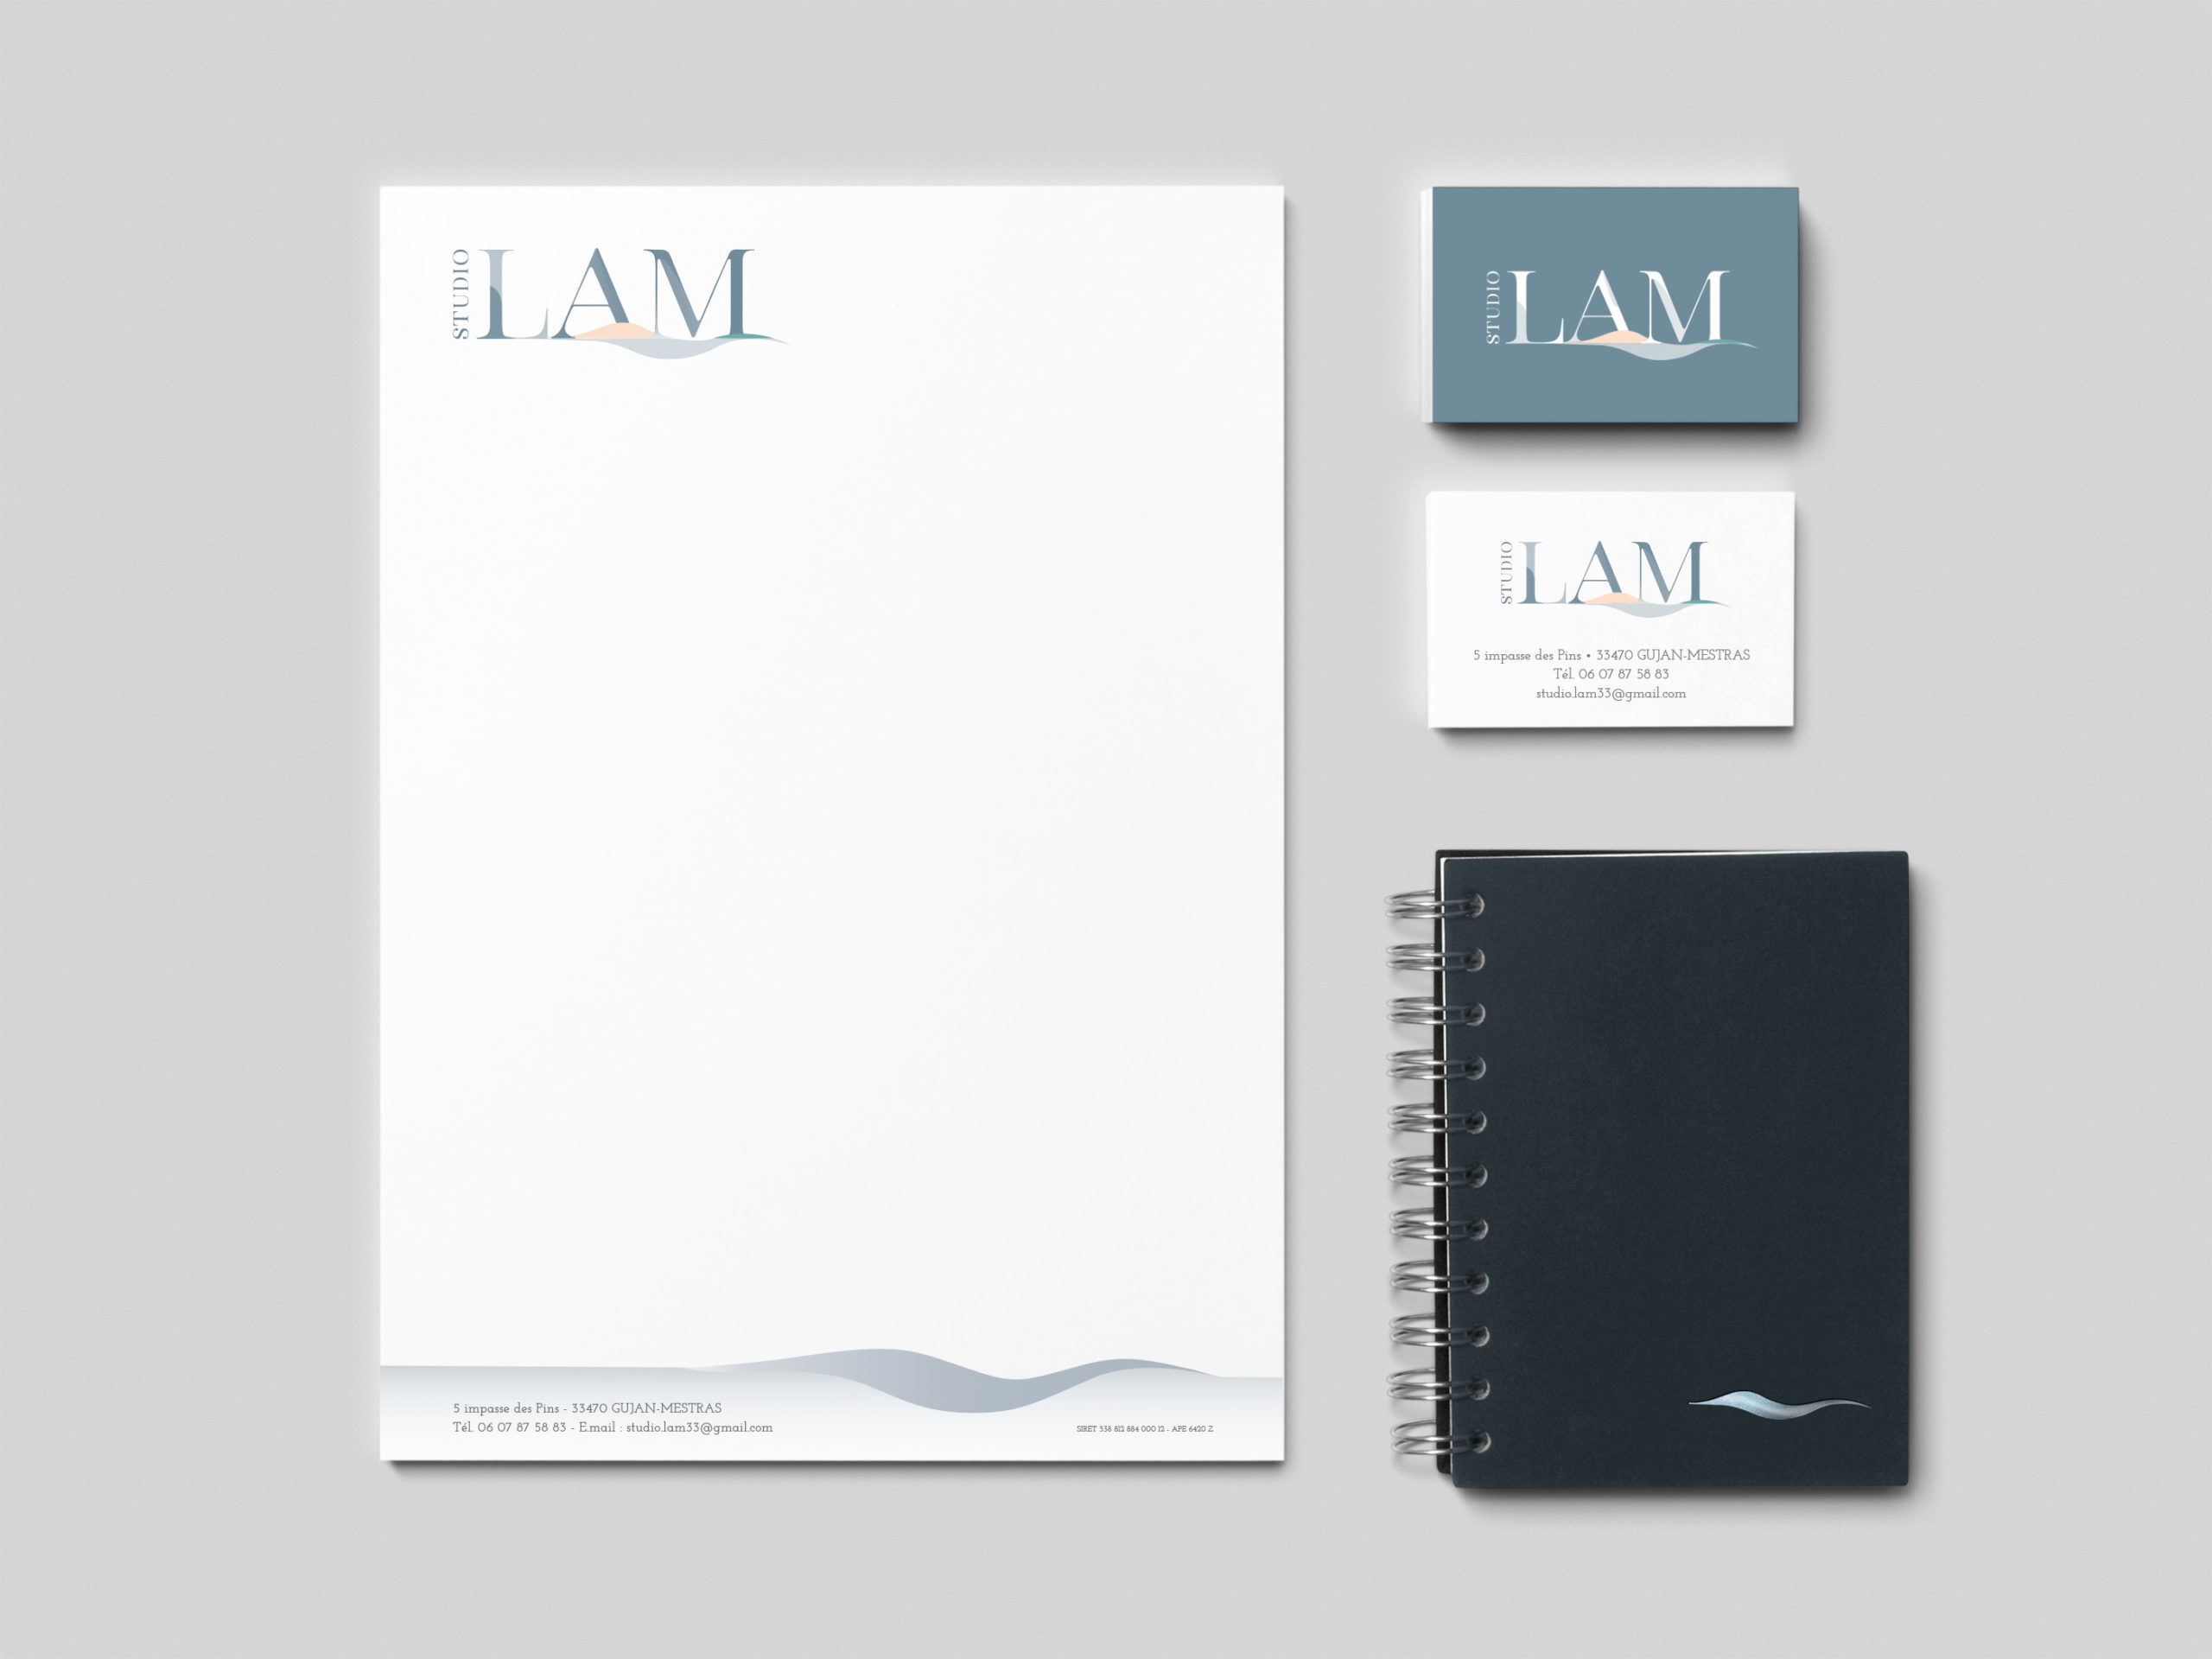 Branding studio lam identity scaled